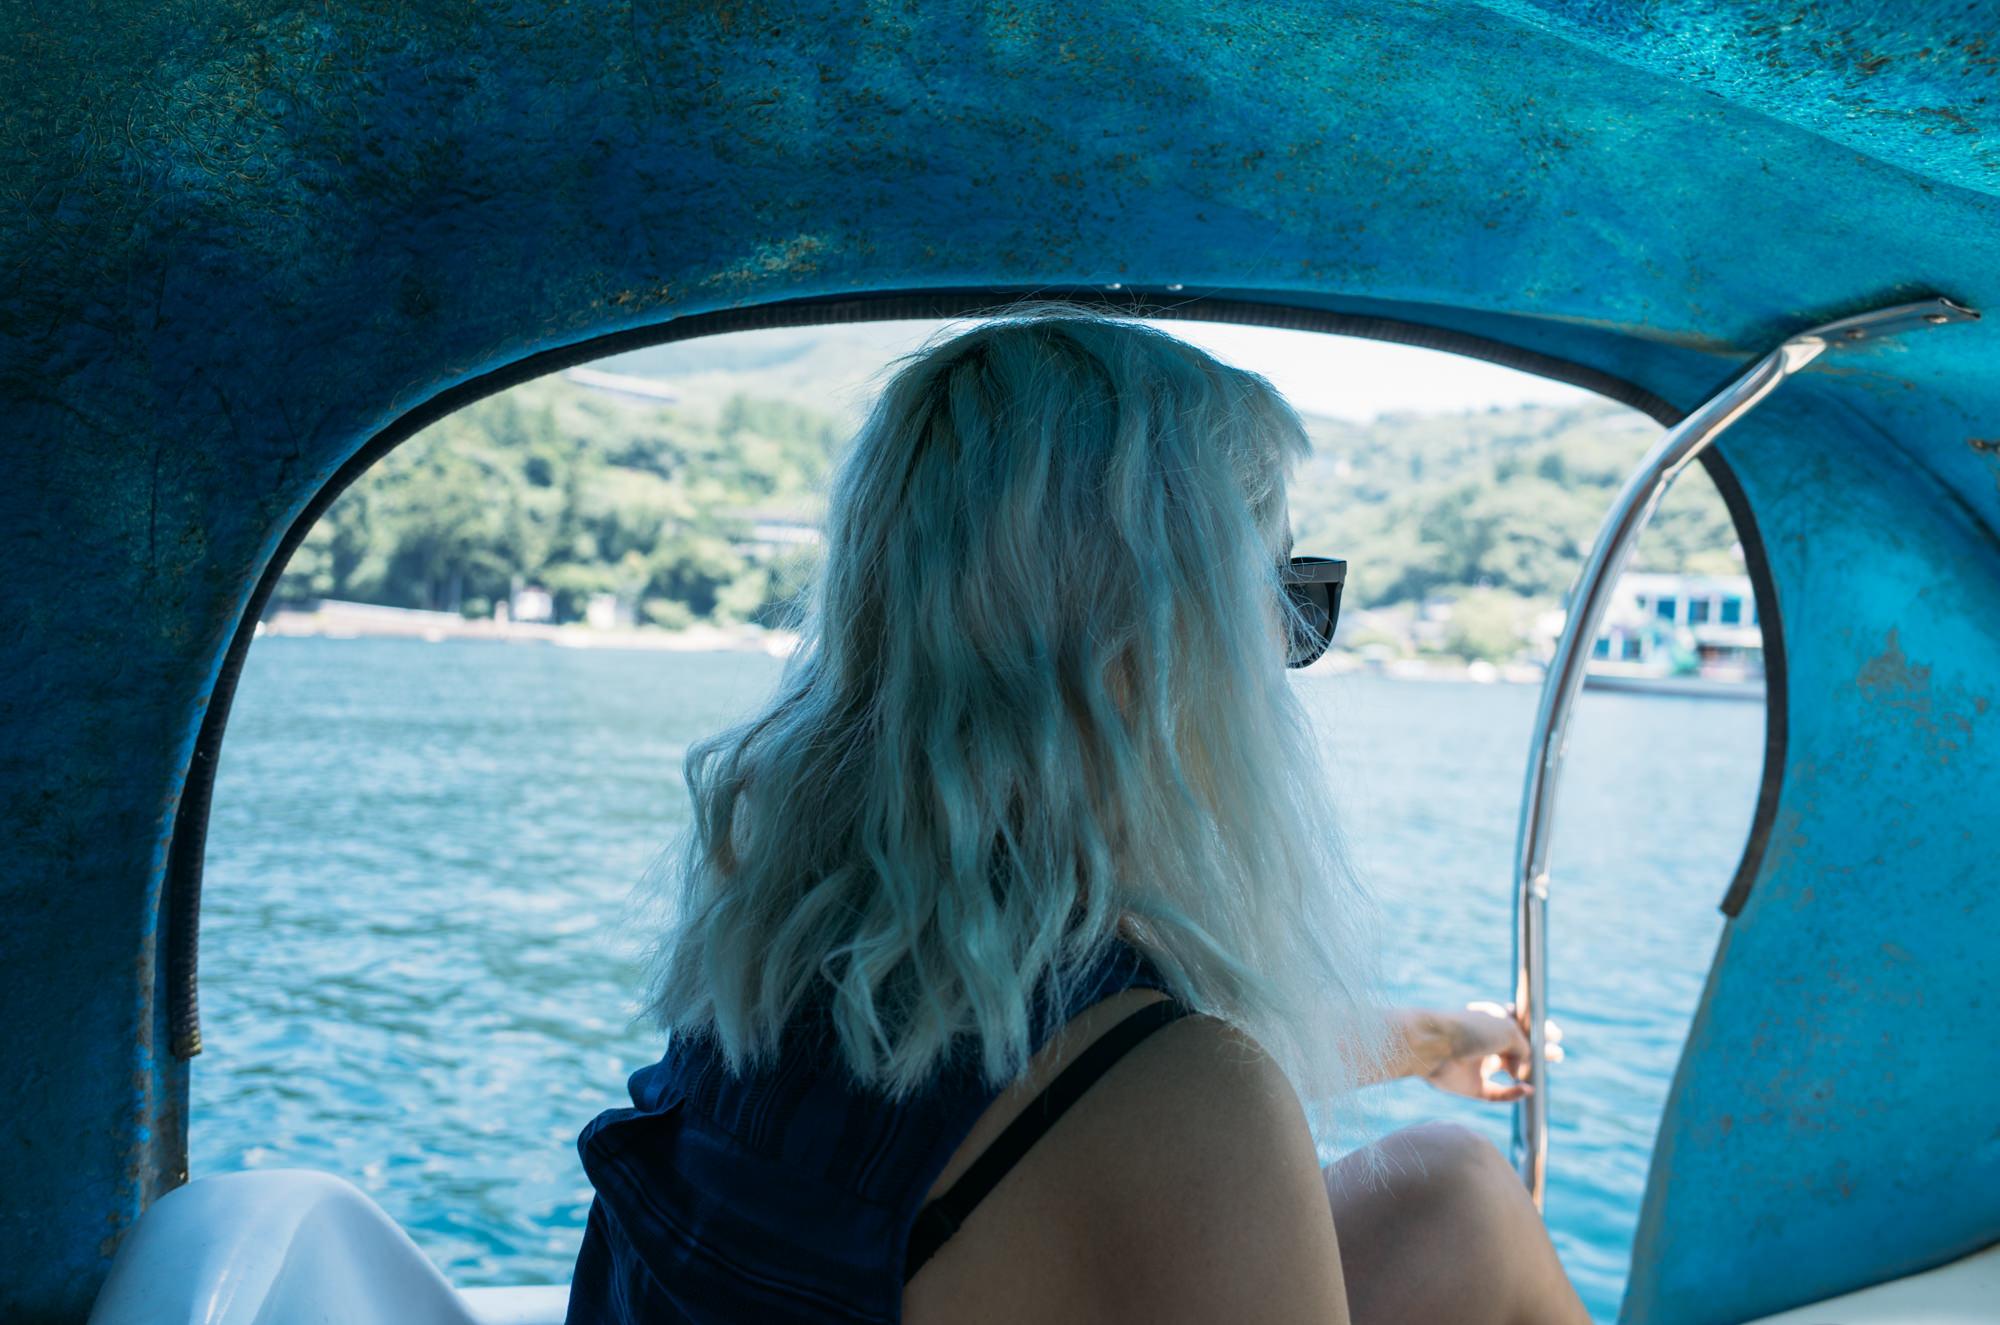 wrenee-hakone-japan-lake-ashi-swan-boats-13.jpg